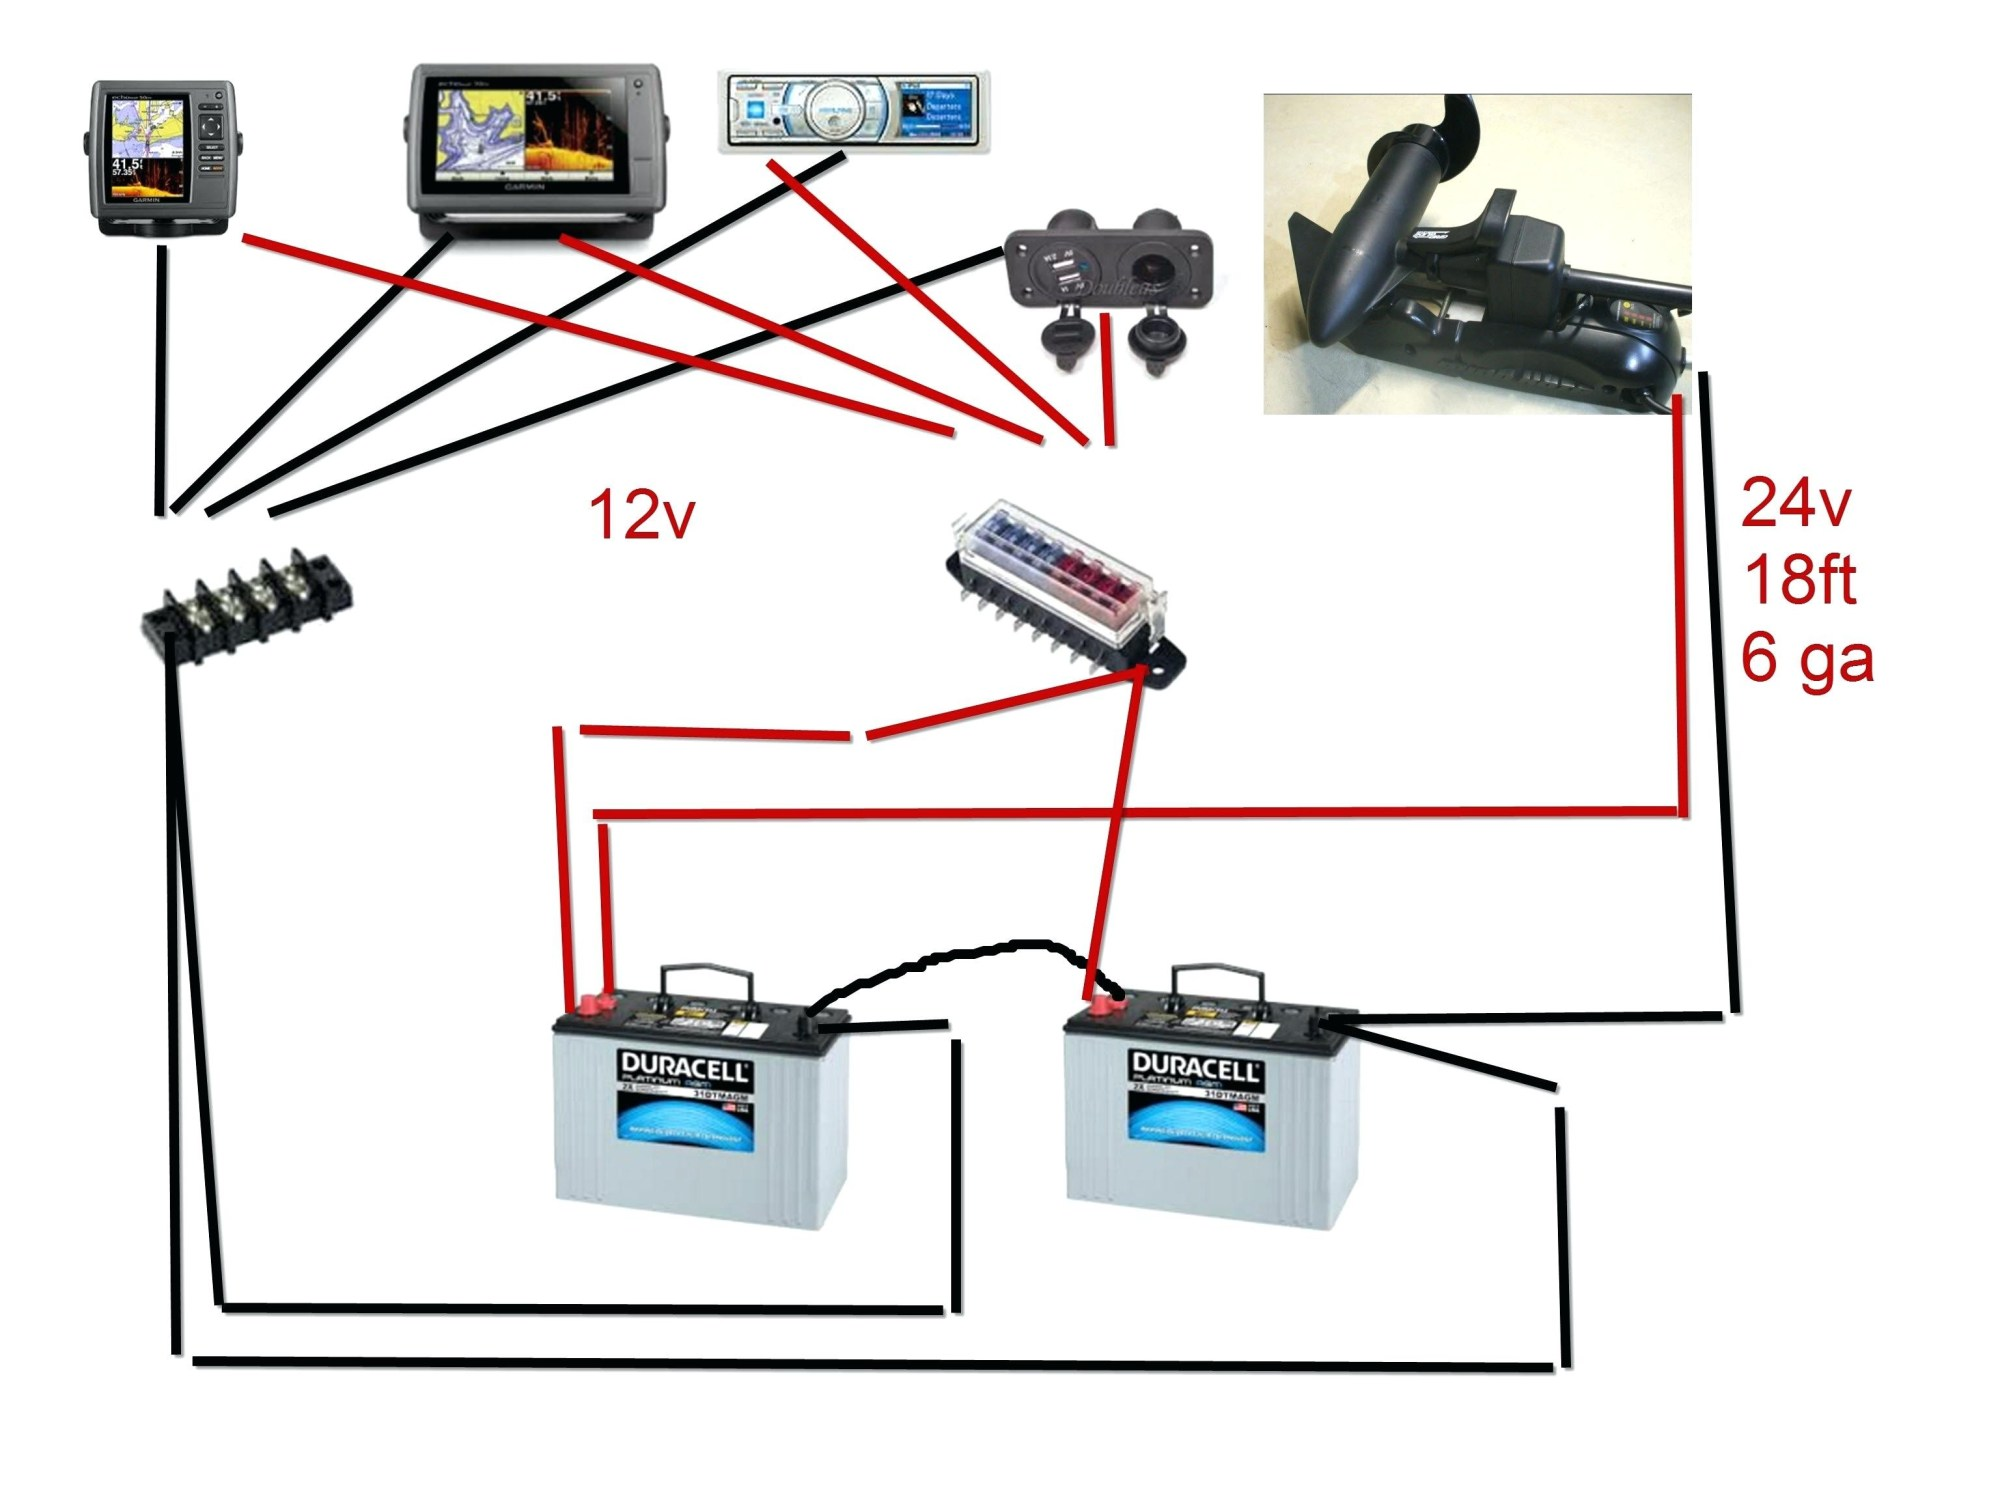 hight resolution of wrg 4948 minn kota 36 volt battery wiring diagram minn kota battery wiring diagram 36